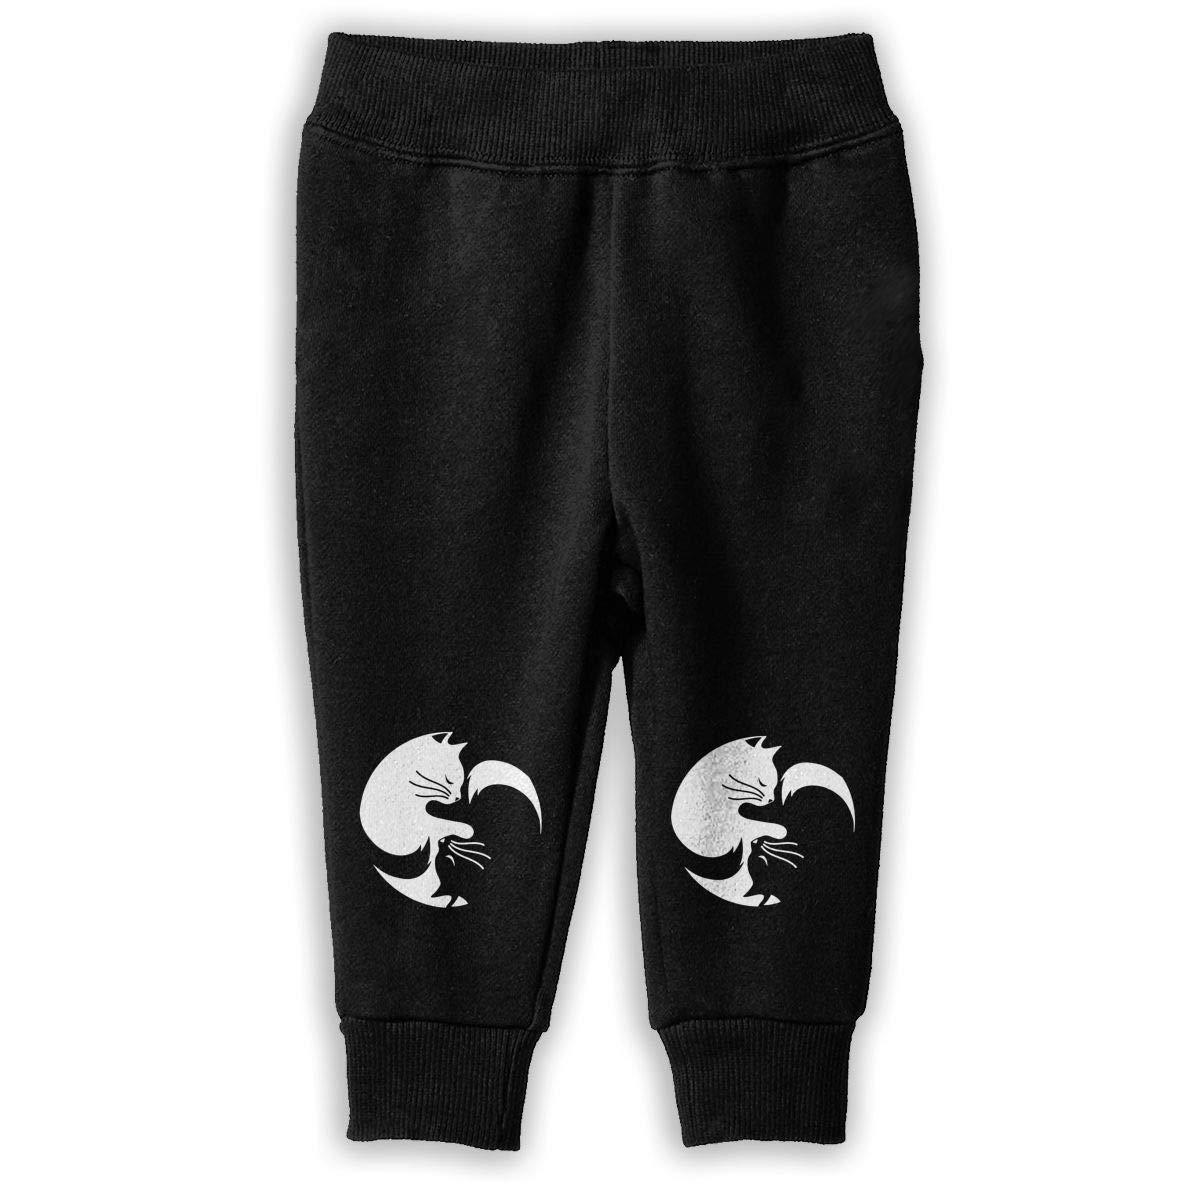 Printed Ying Yang Cat Child Boys /& Girls Unisex Sports Sweatpants